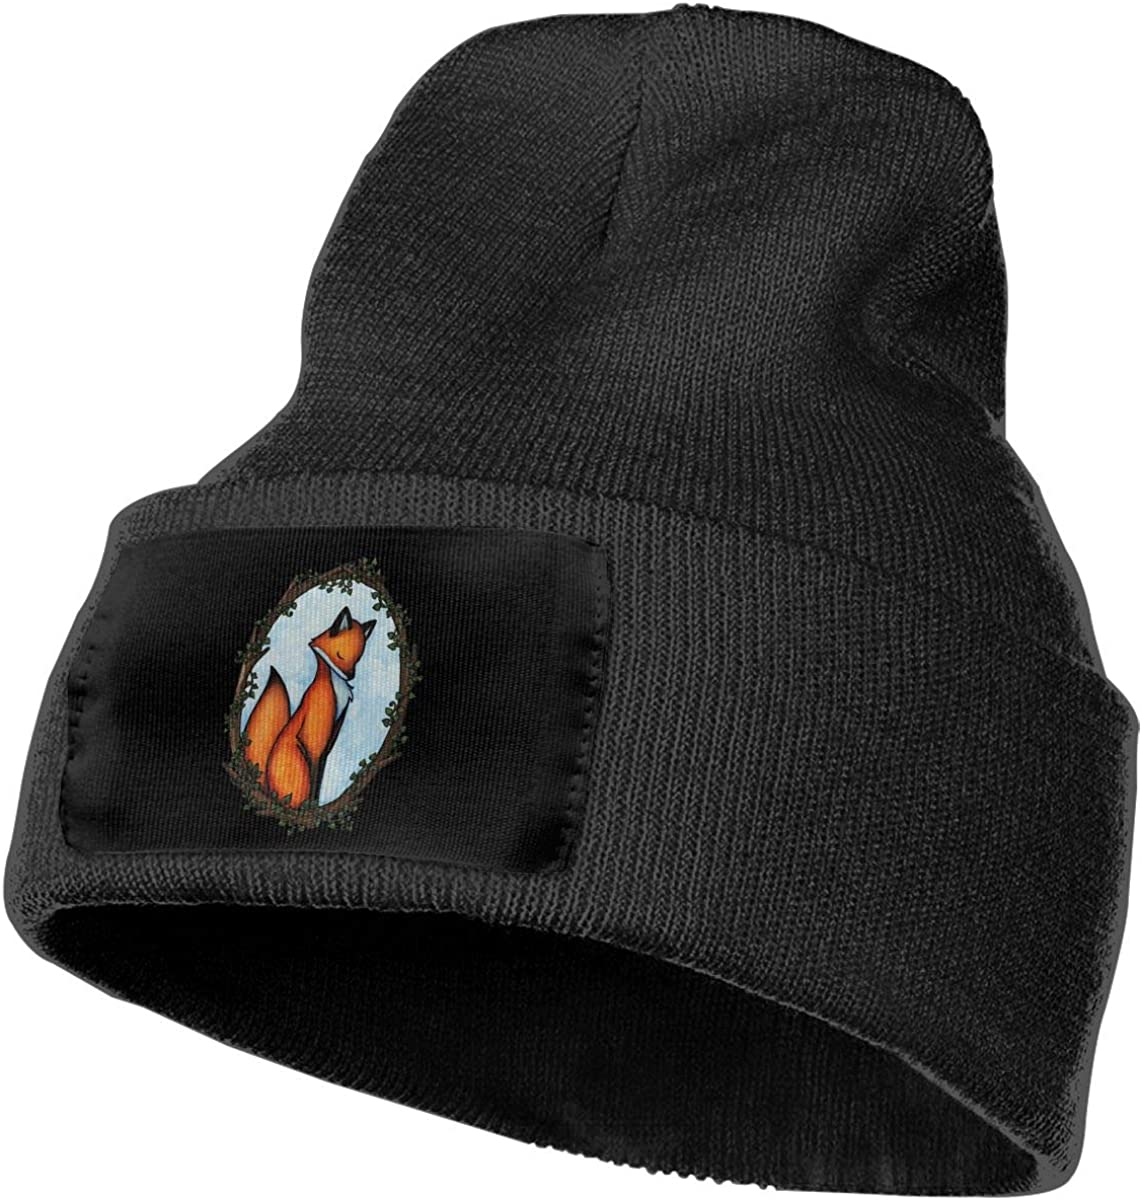 SLADDD1 Stand Back Im Going to Try Science Warm Winter Hat Knit Beanie Skull Cap Cuff Beanie Hat Winter Hats for Men /& Women